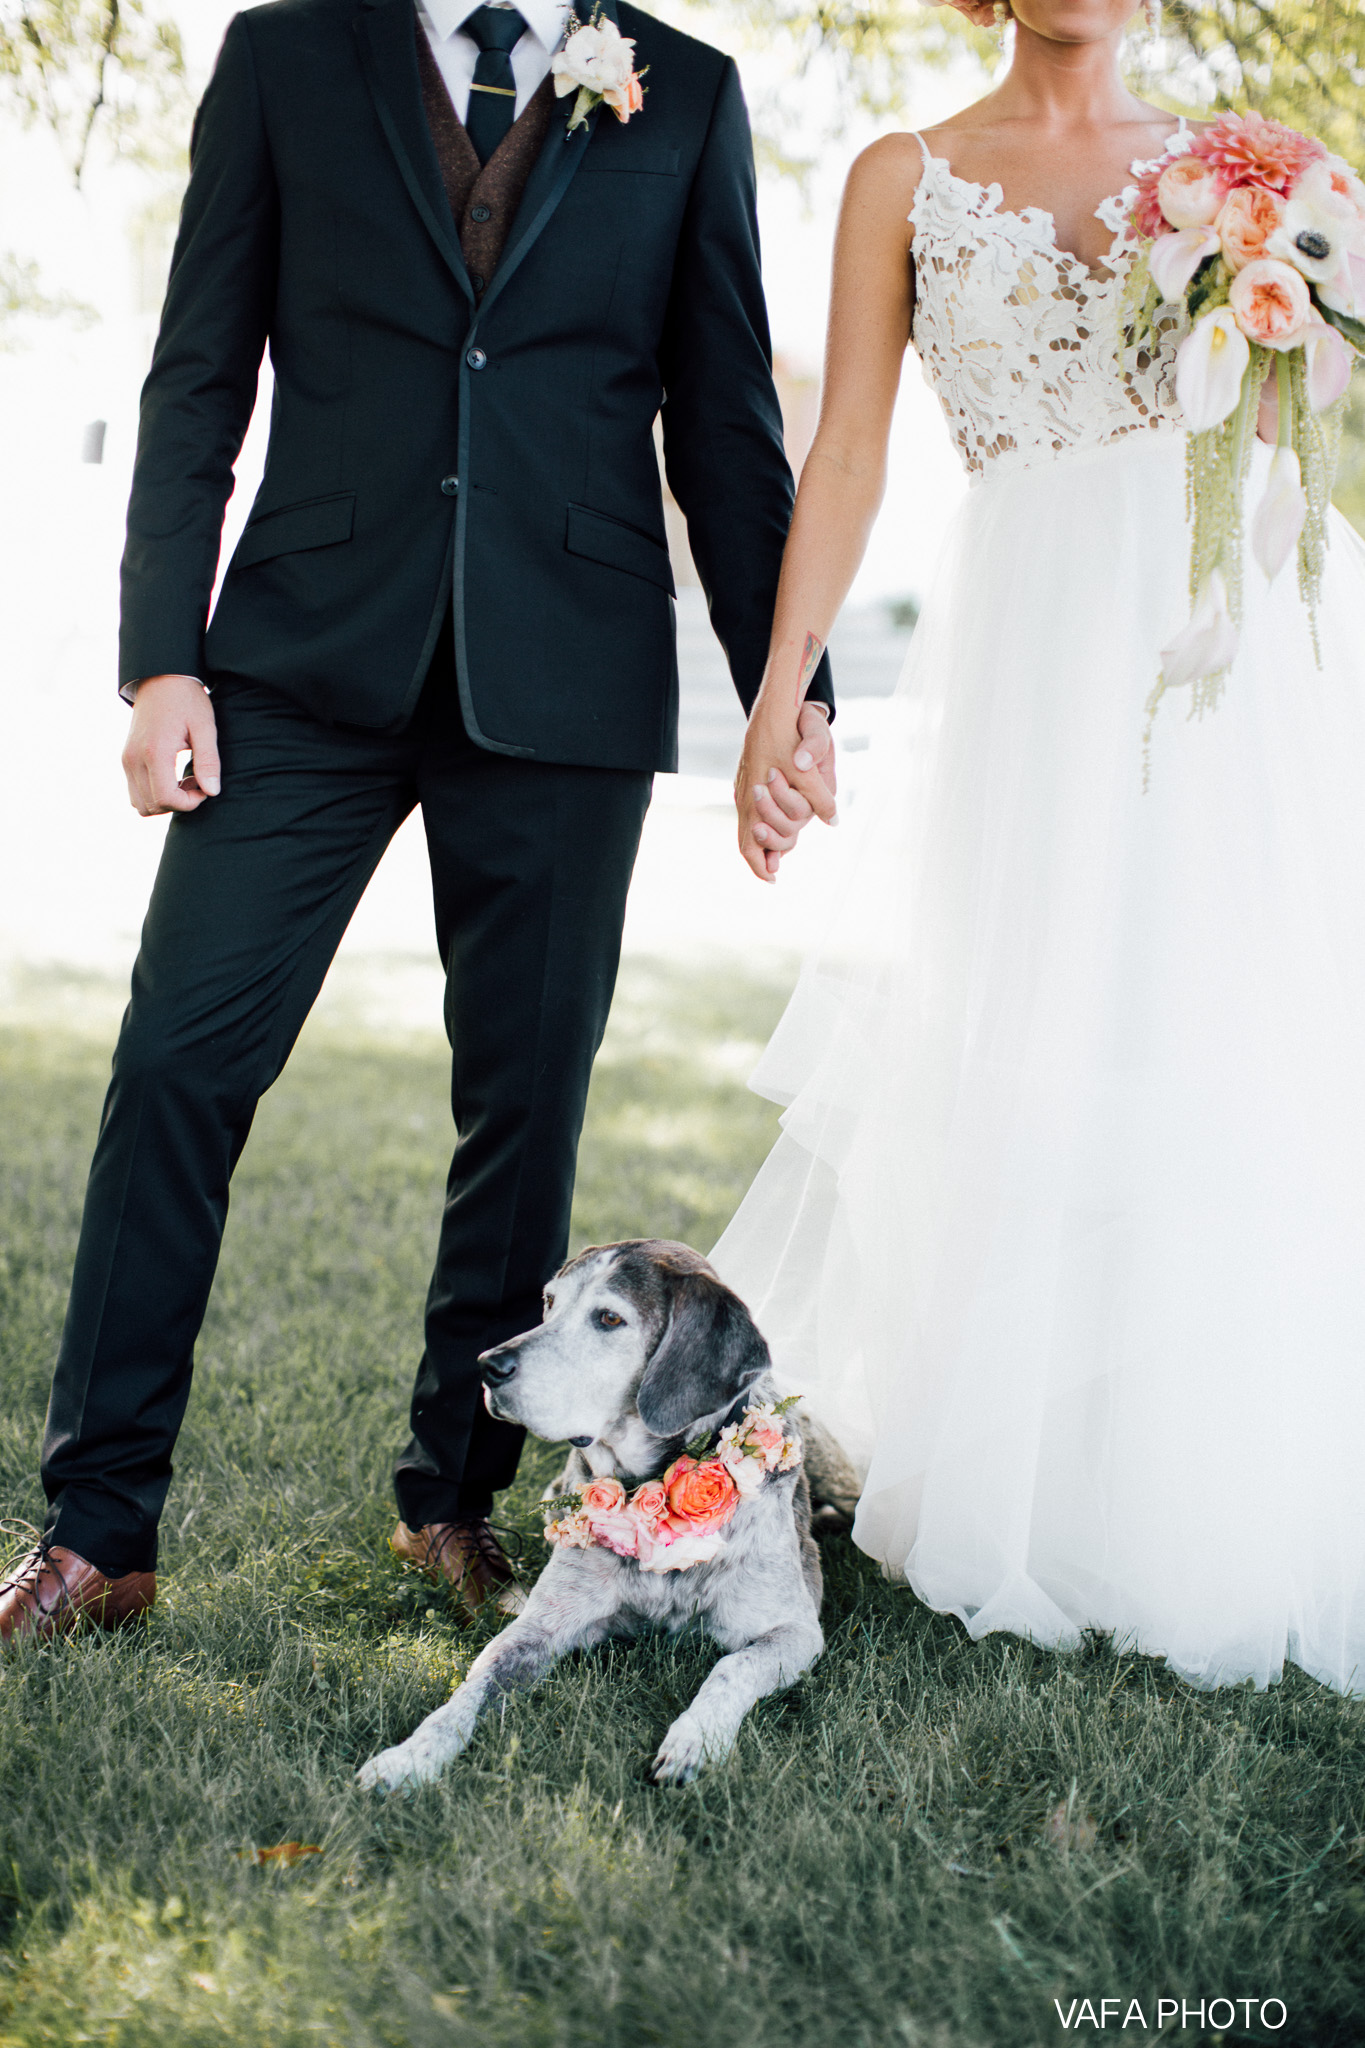 The-Felt-Estate-Wedding-Kailie-David-Vafa-Photo-550.jpg